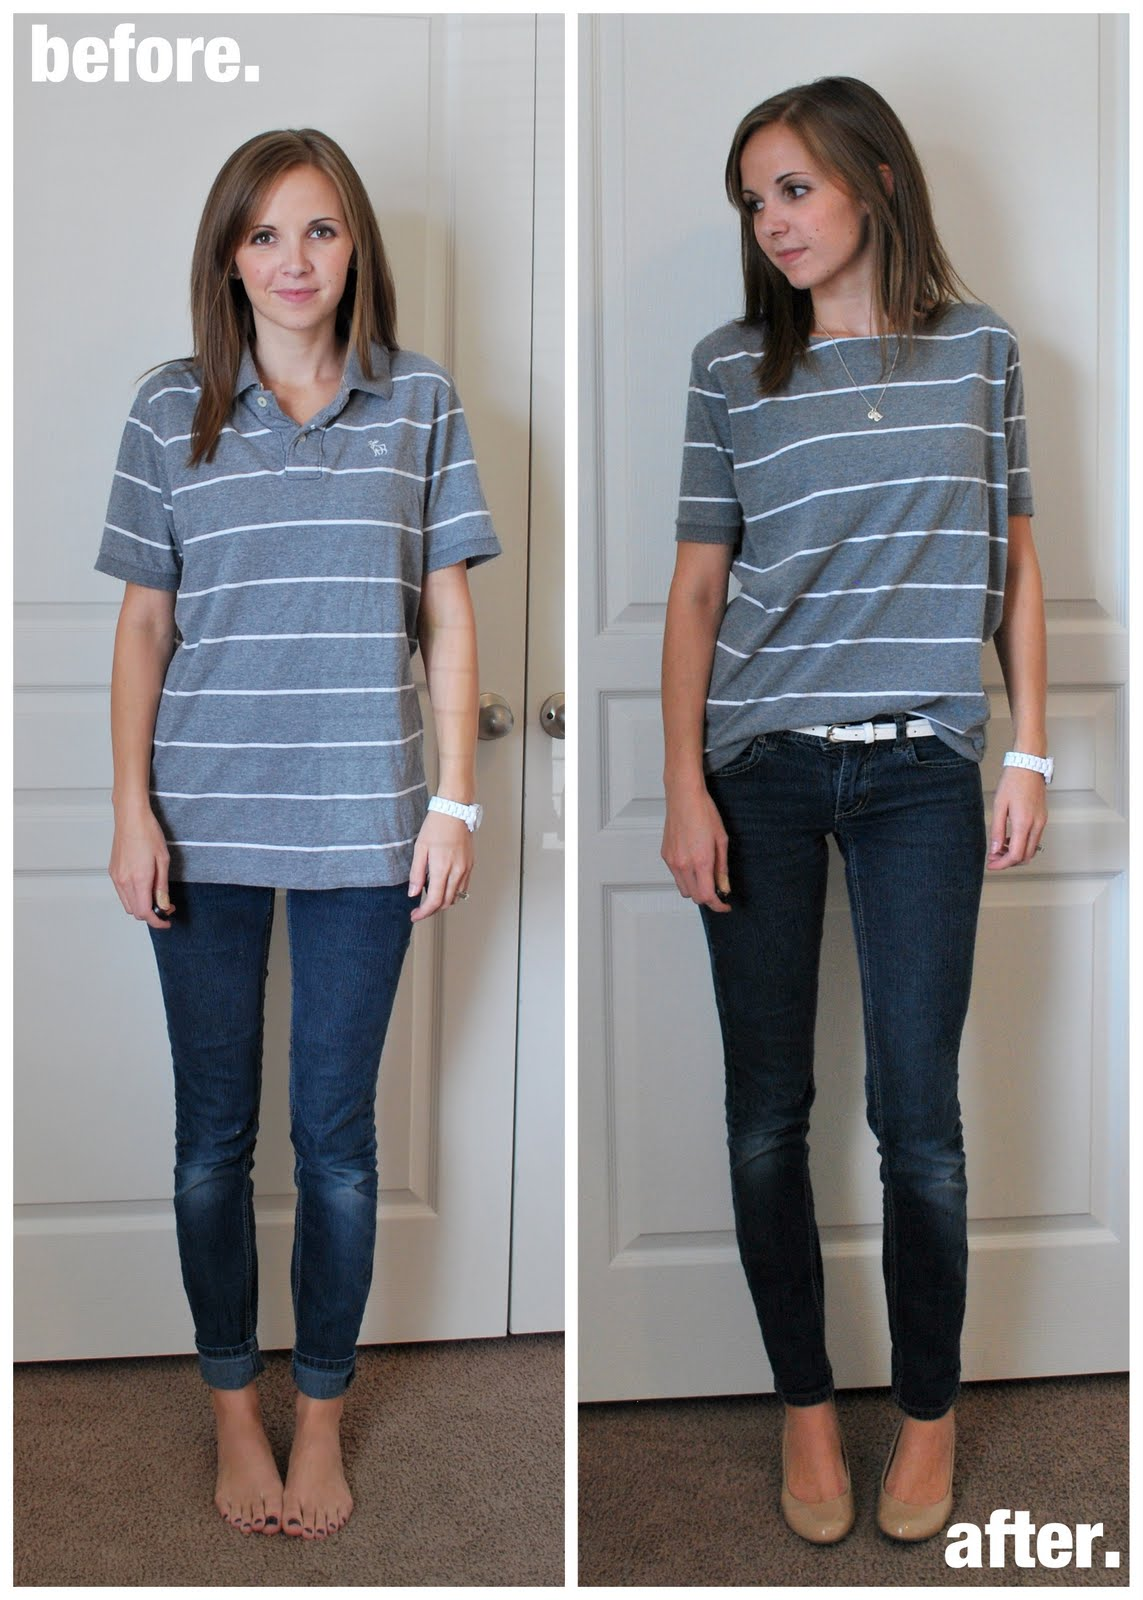 Cute Polo Shirts For School 8dea41a21